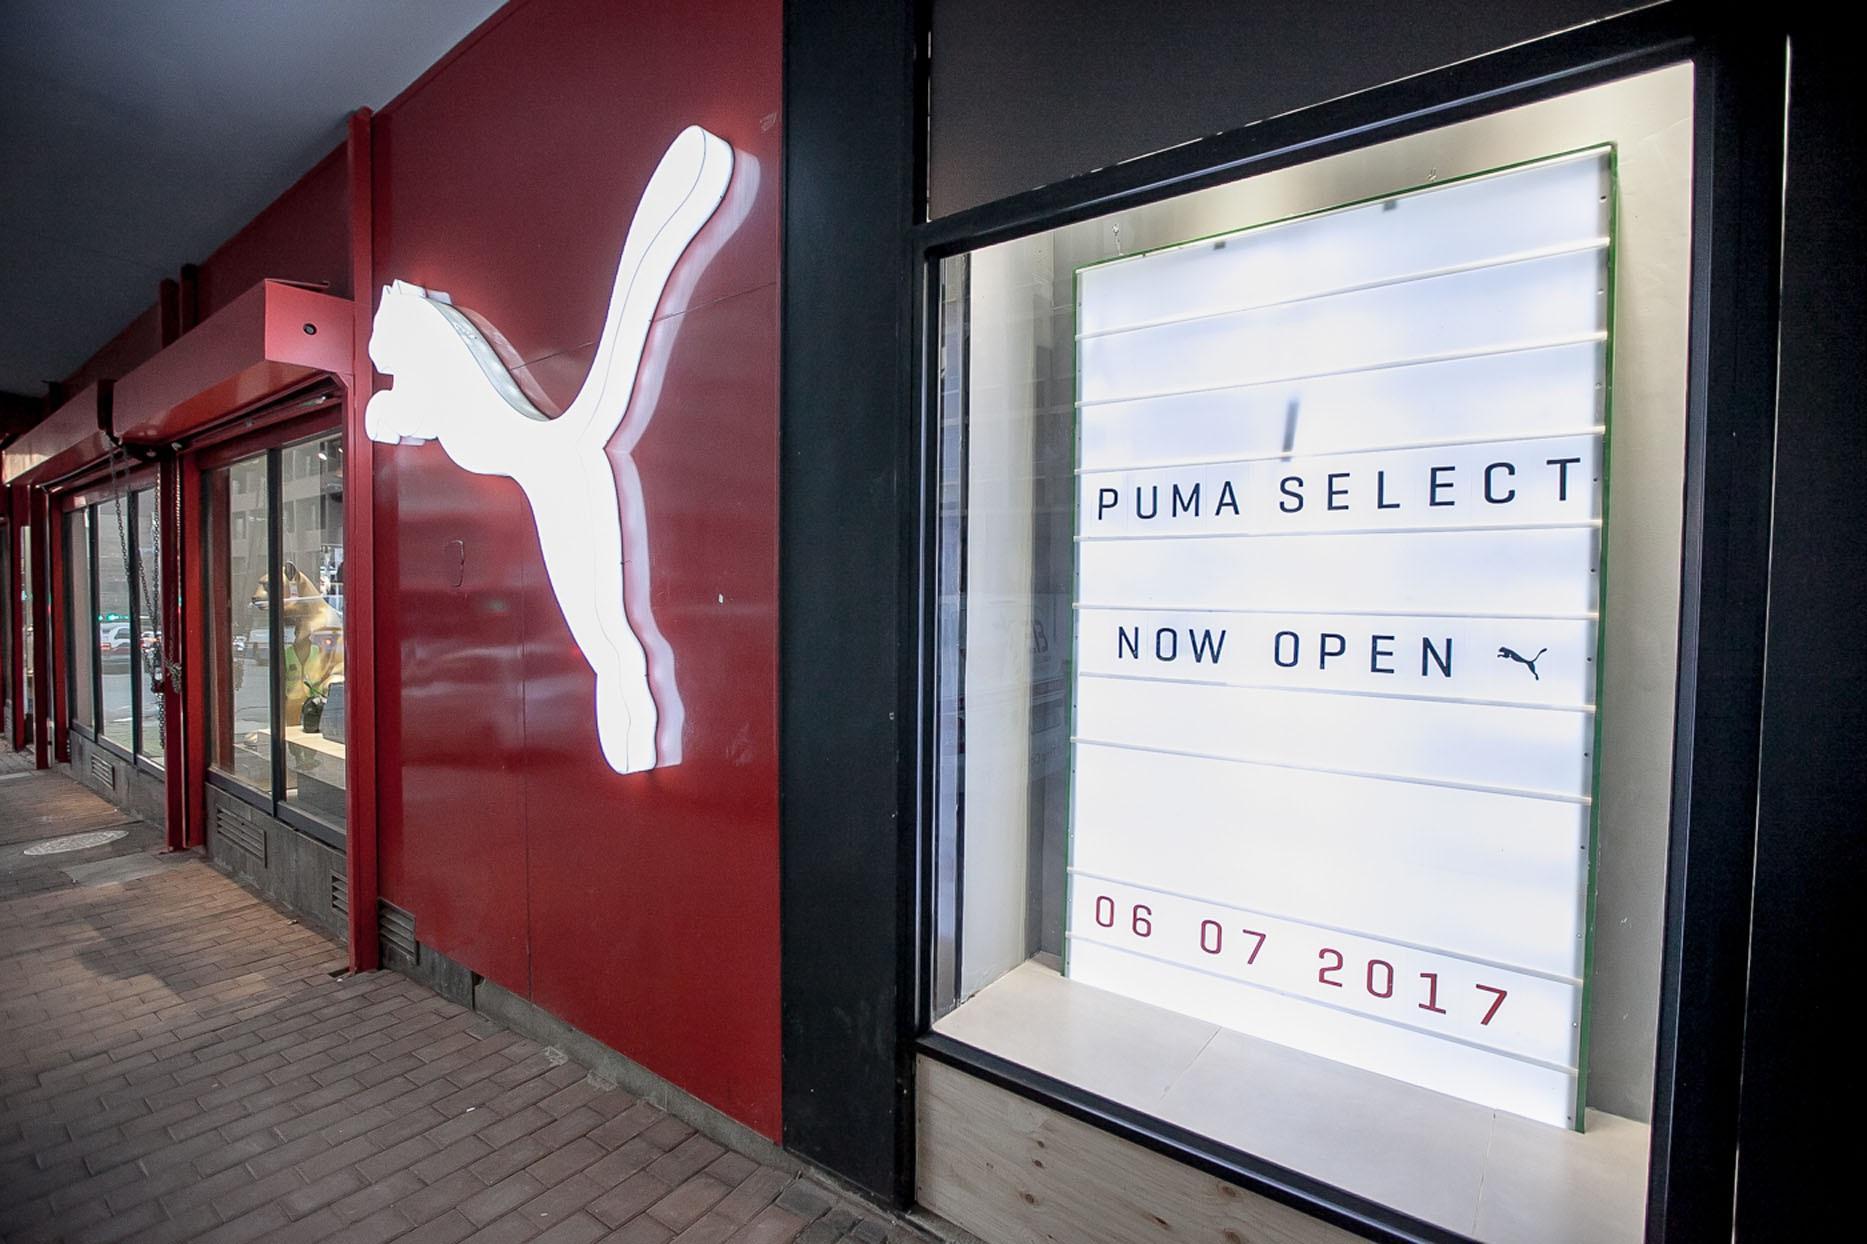 Puma Select Braamfontein revamp revealed